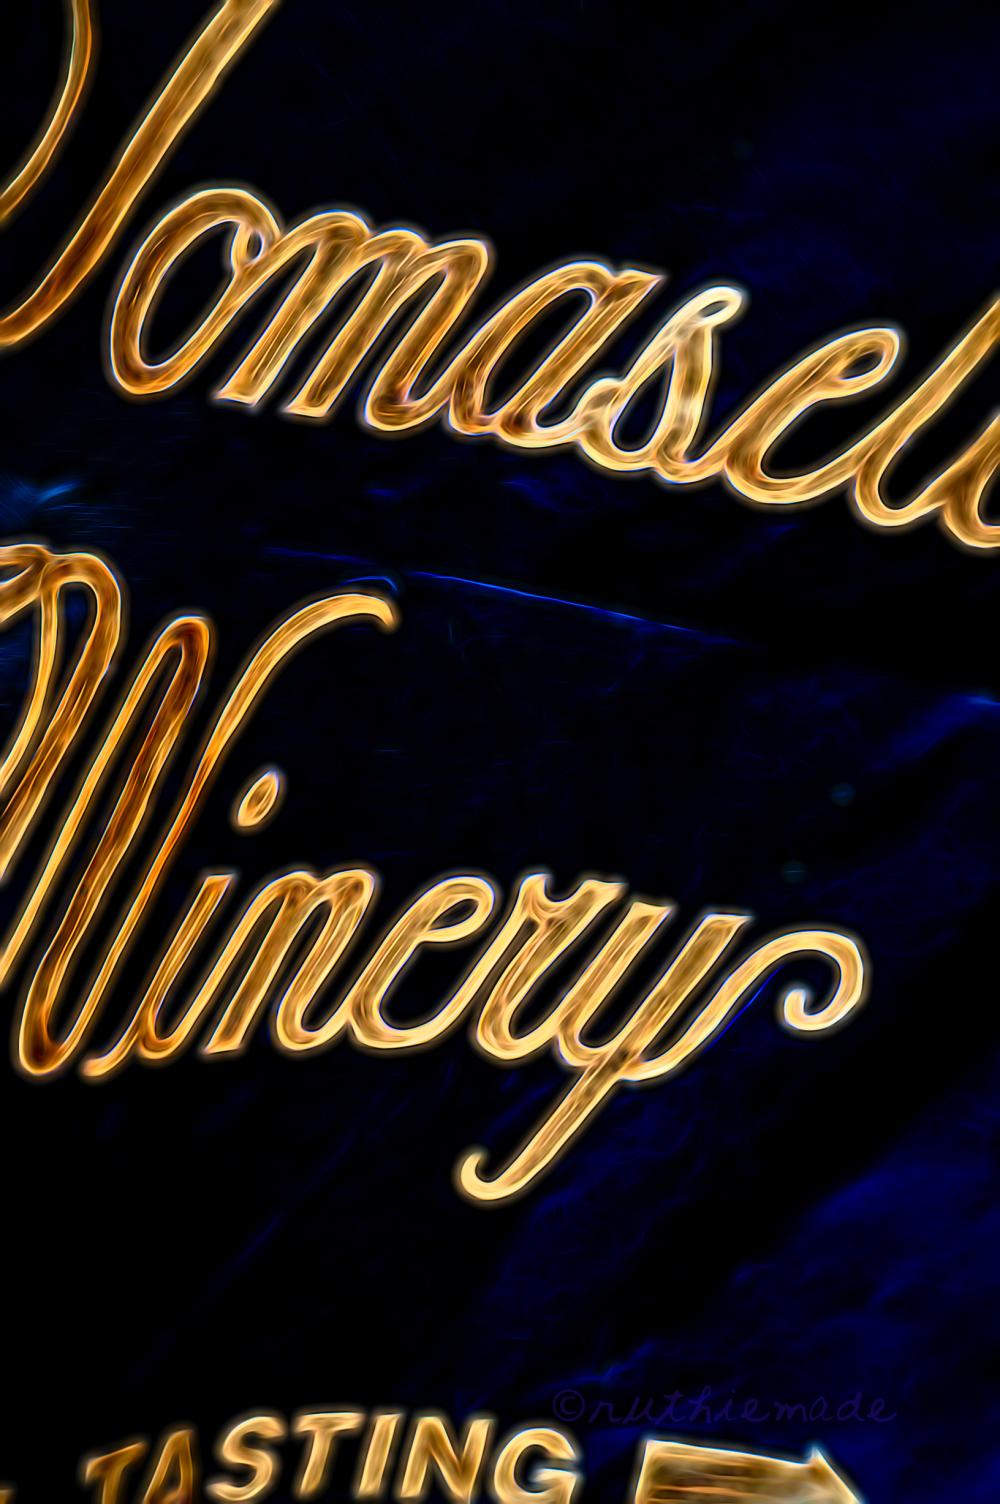 Lambertville Winery